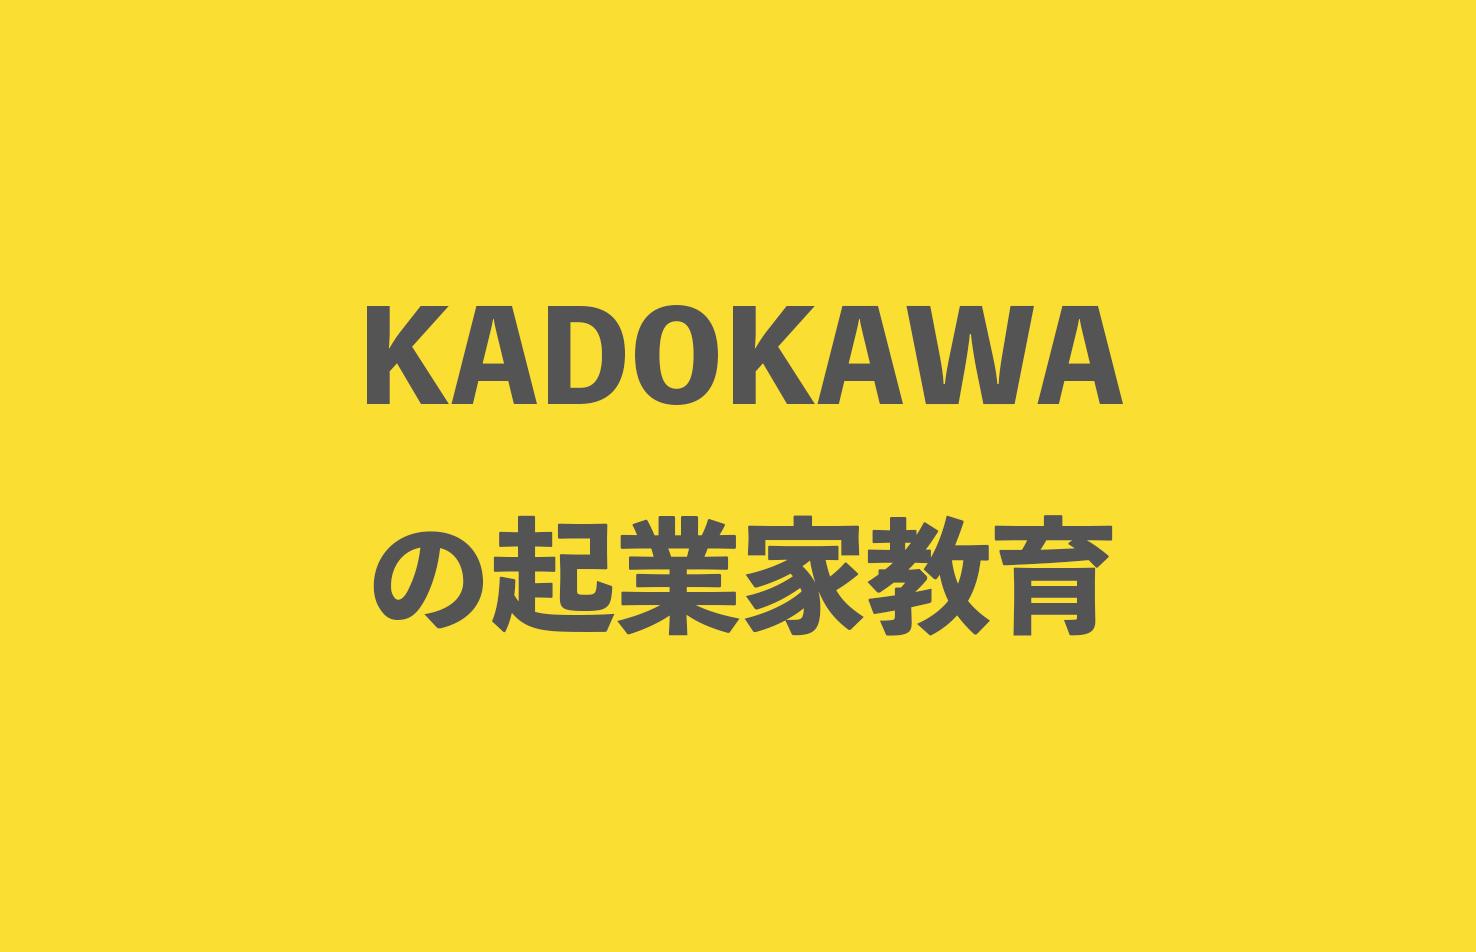 "KADOKAWA、経産省「起業家教育」事業で高校生向けトライアルを実施style=""display:"